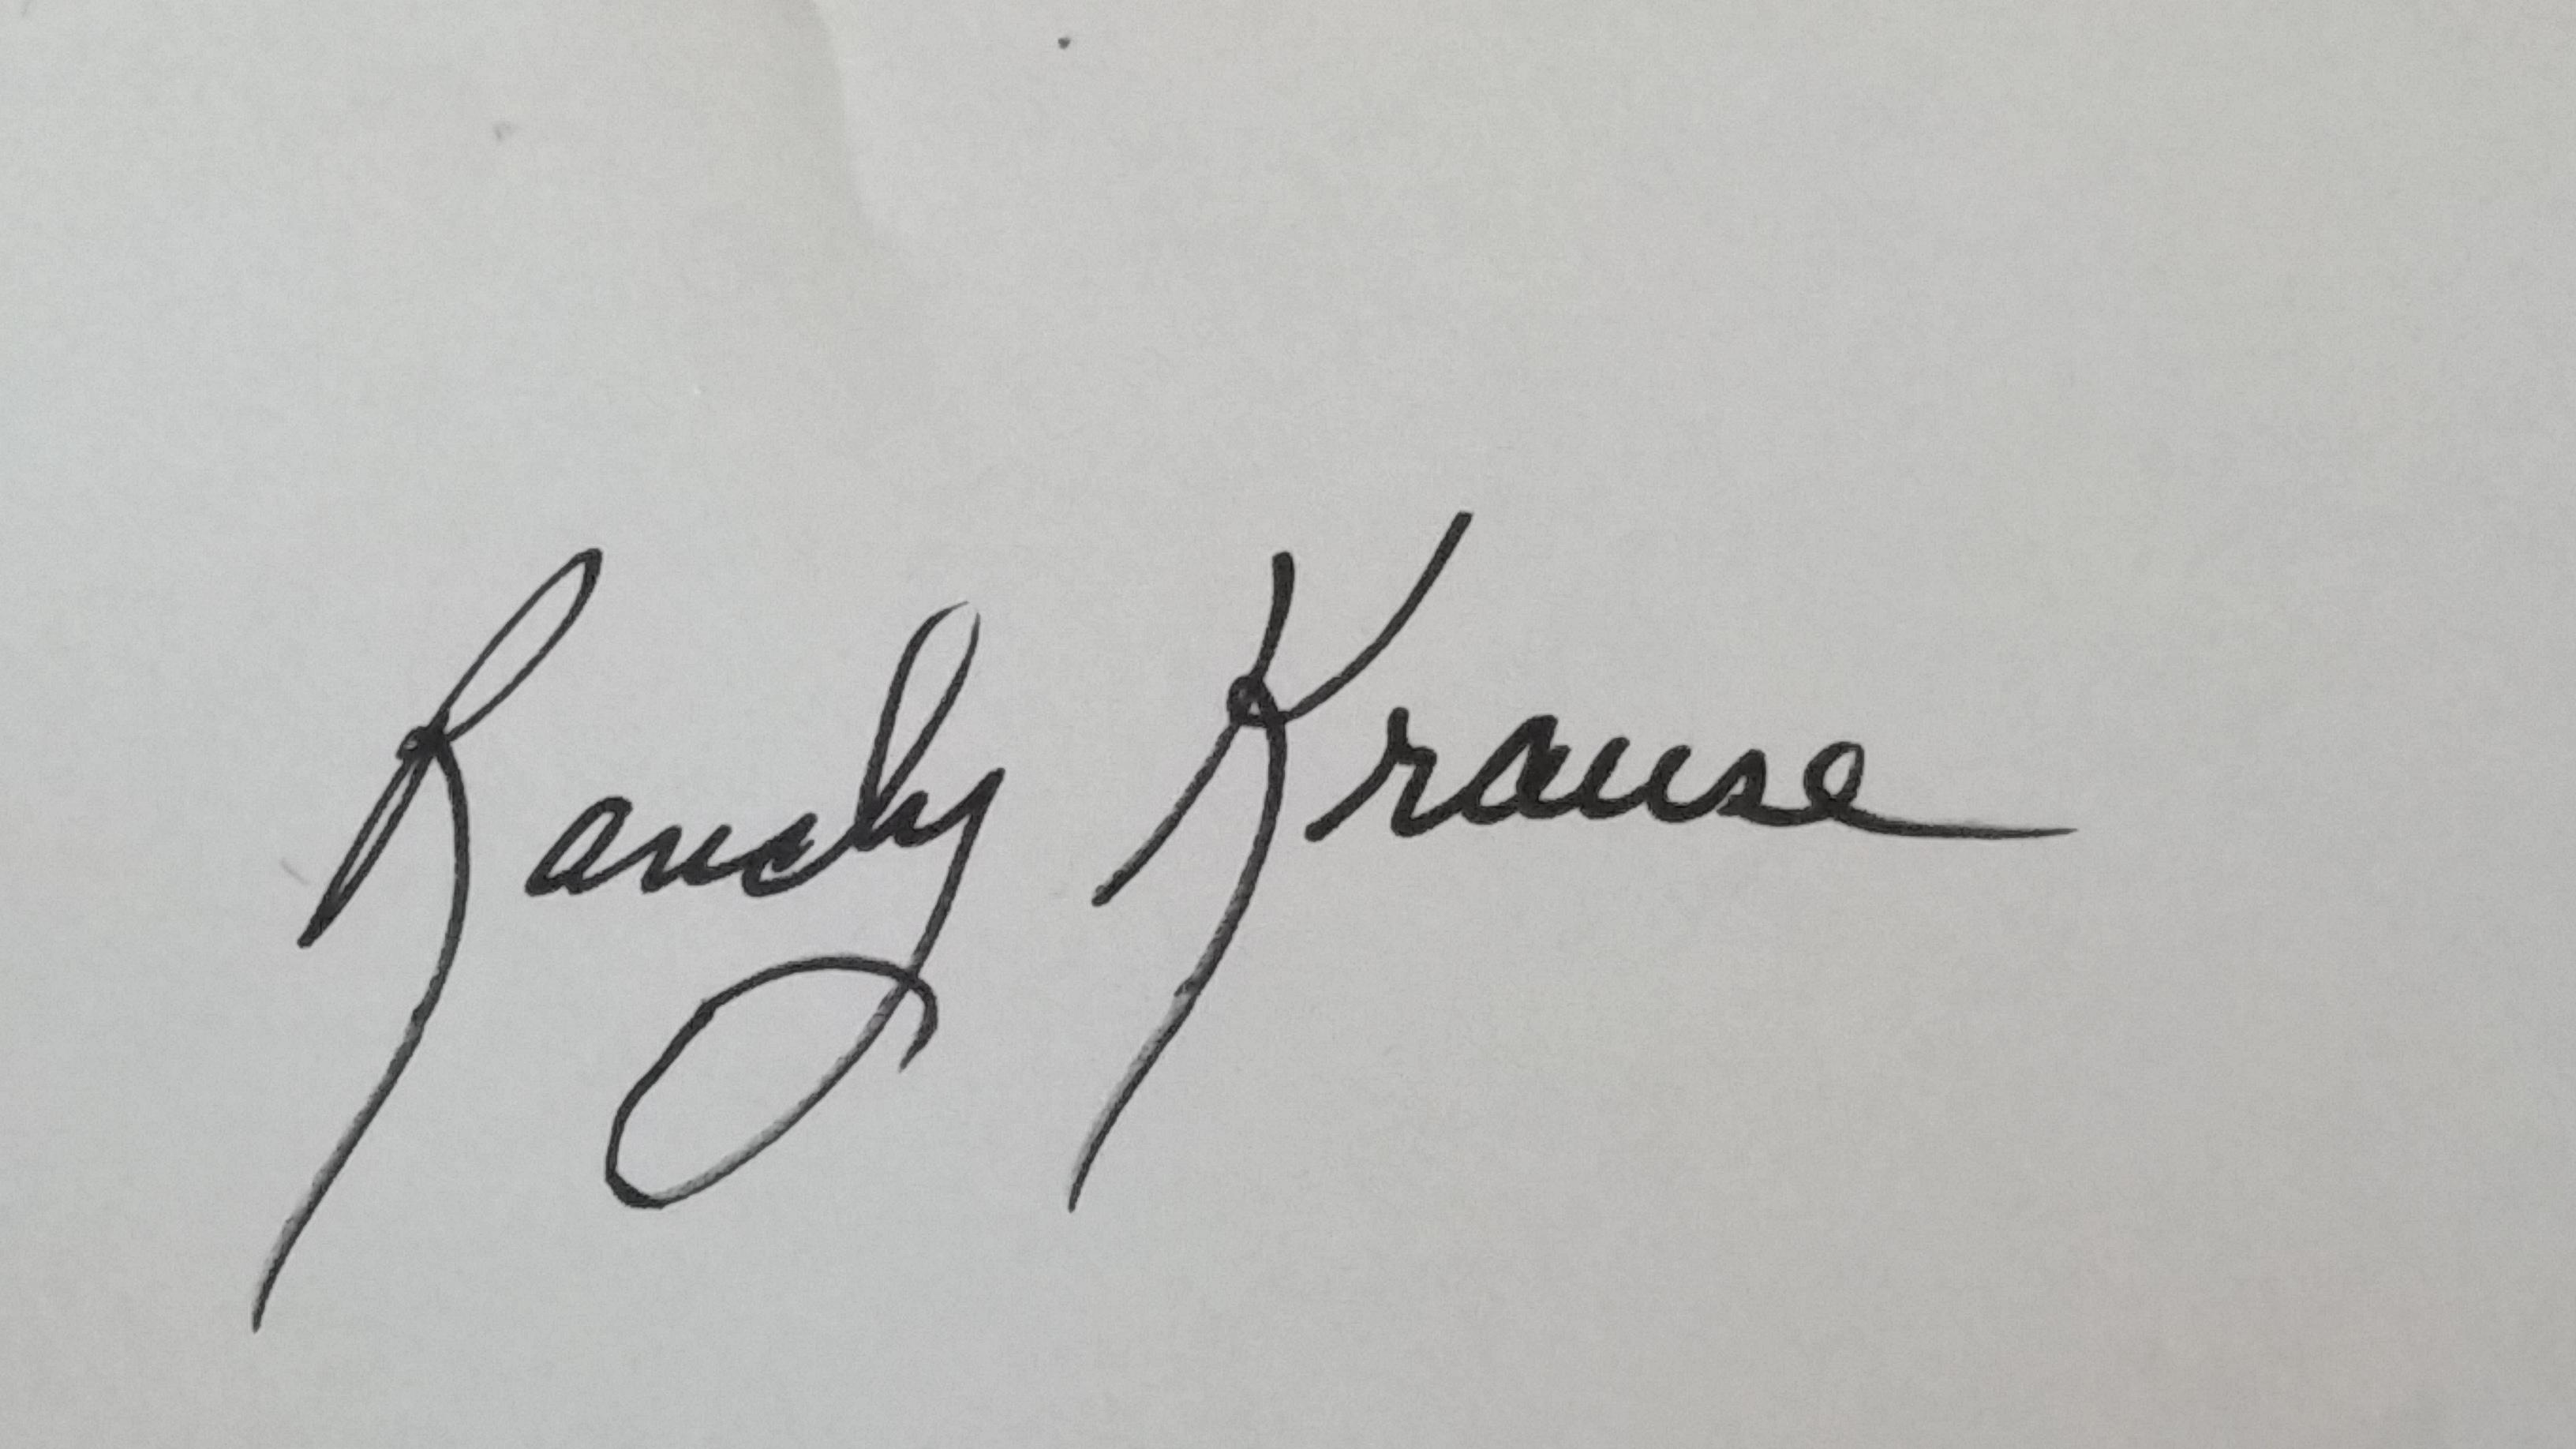 Randy Krause's Signature